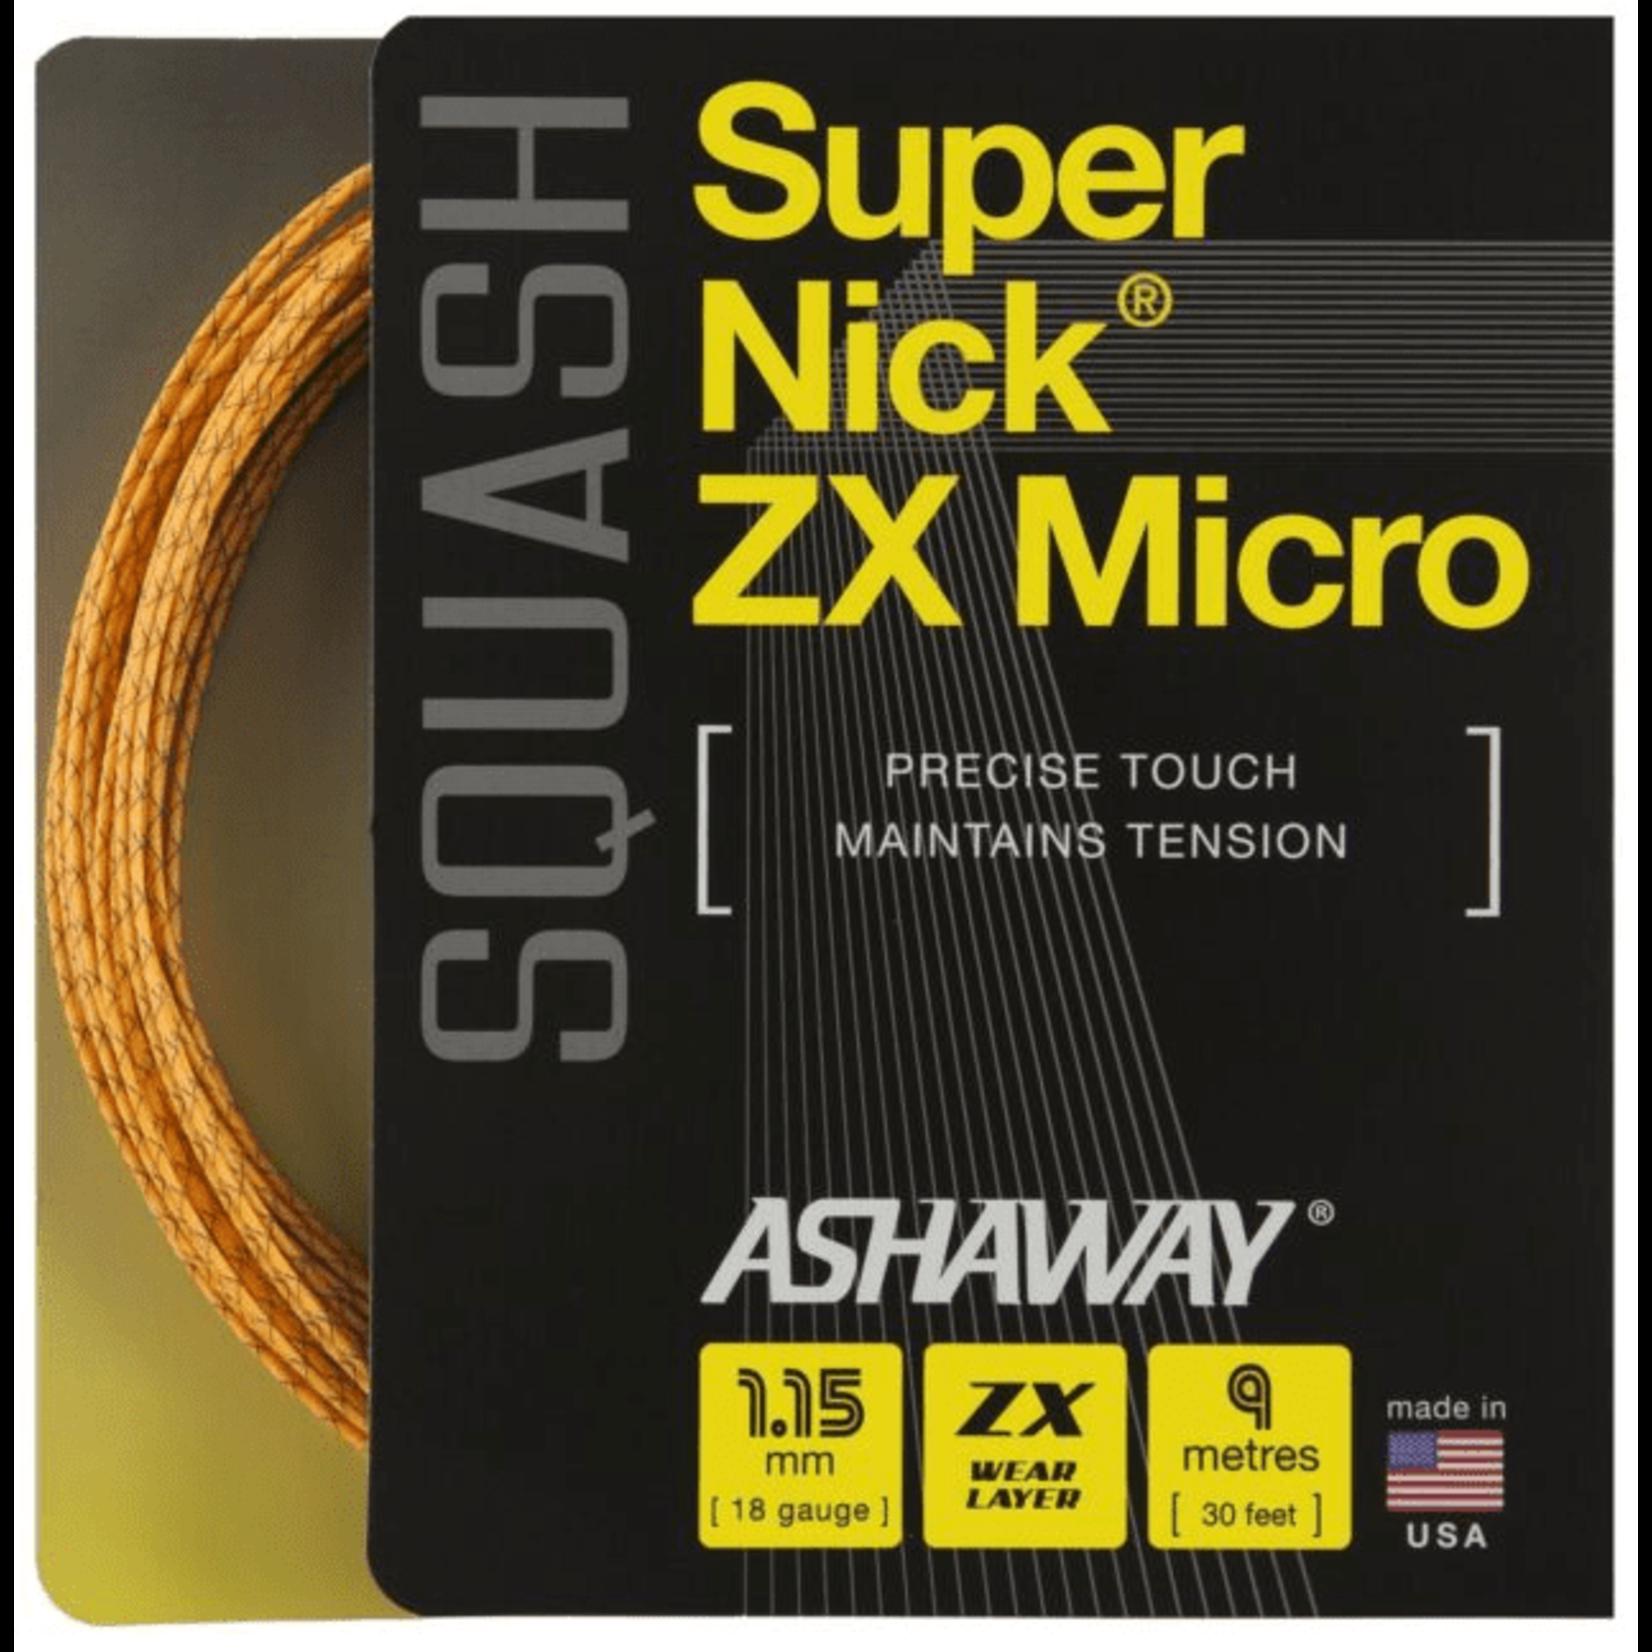 Ashaway SuperNick ZX Micro squash 1,15MM orange SPIRAL